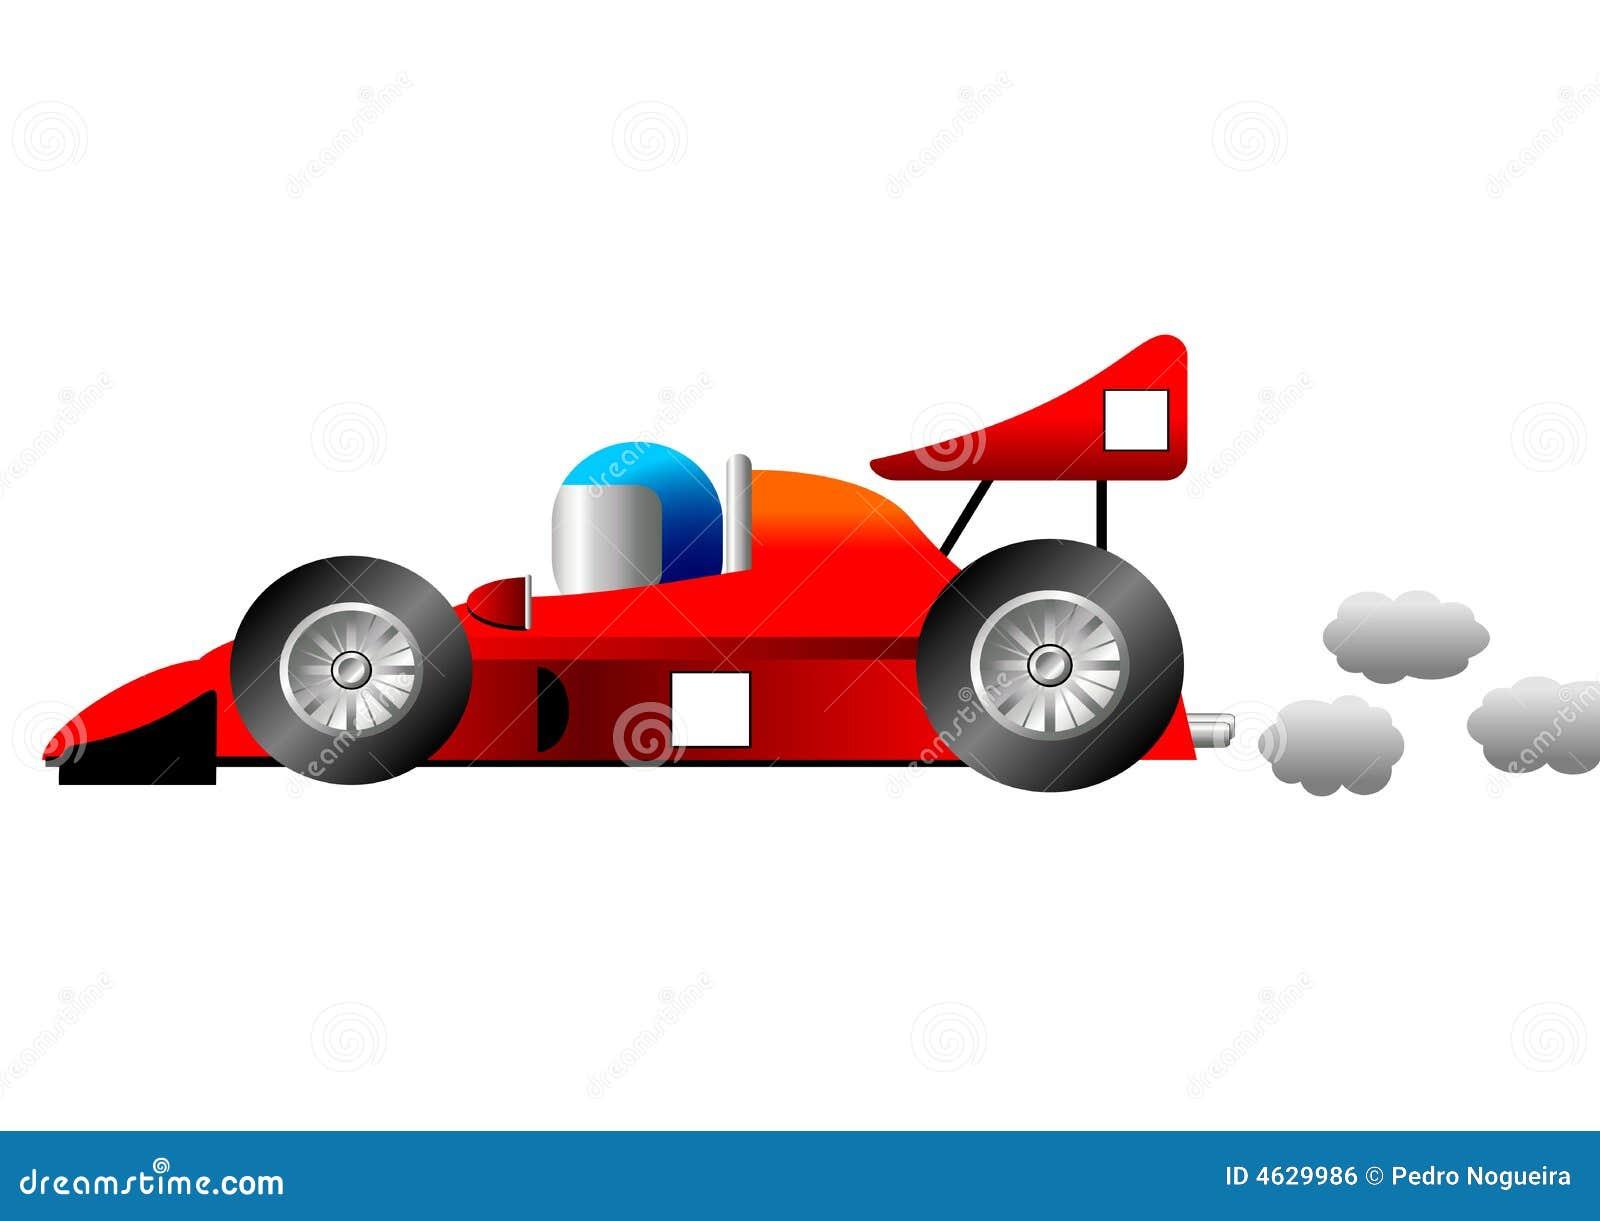 Funny race car stock vector. Illustration of sport, comic ...